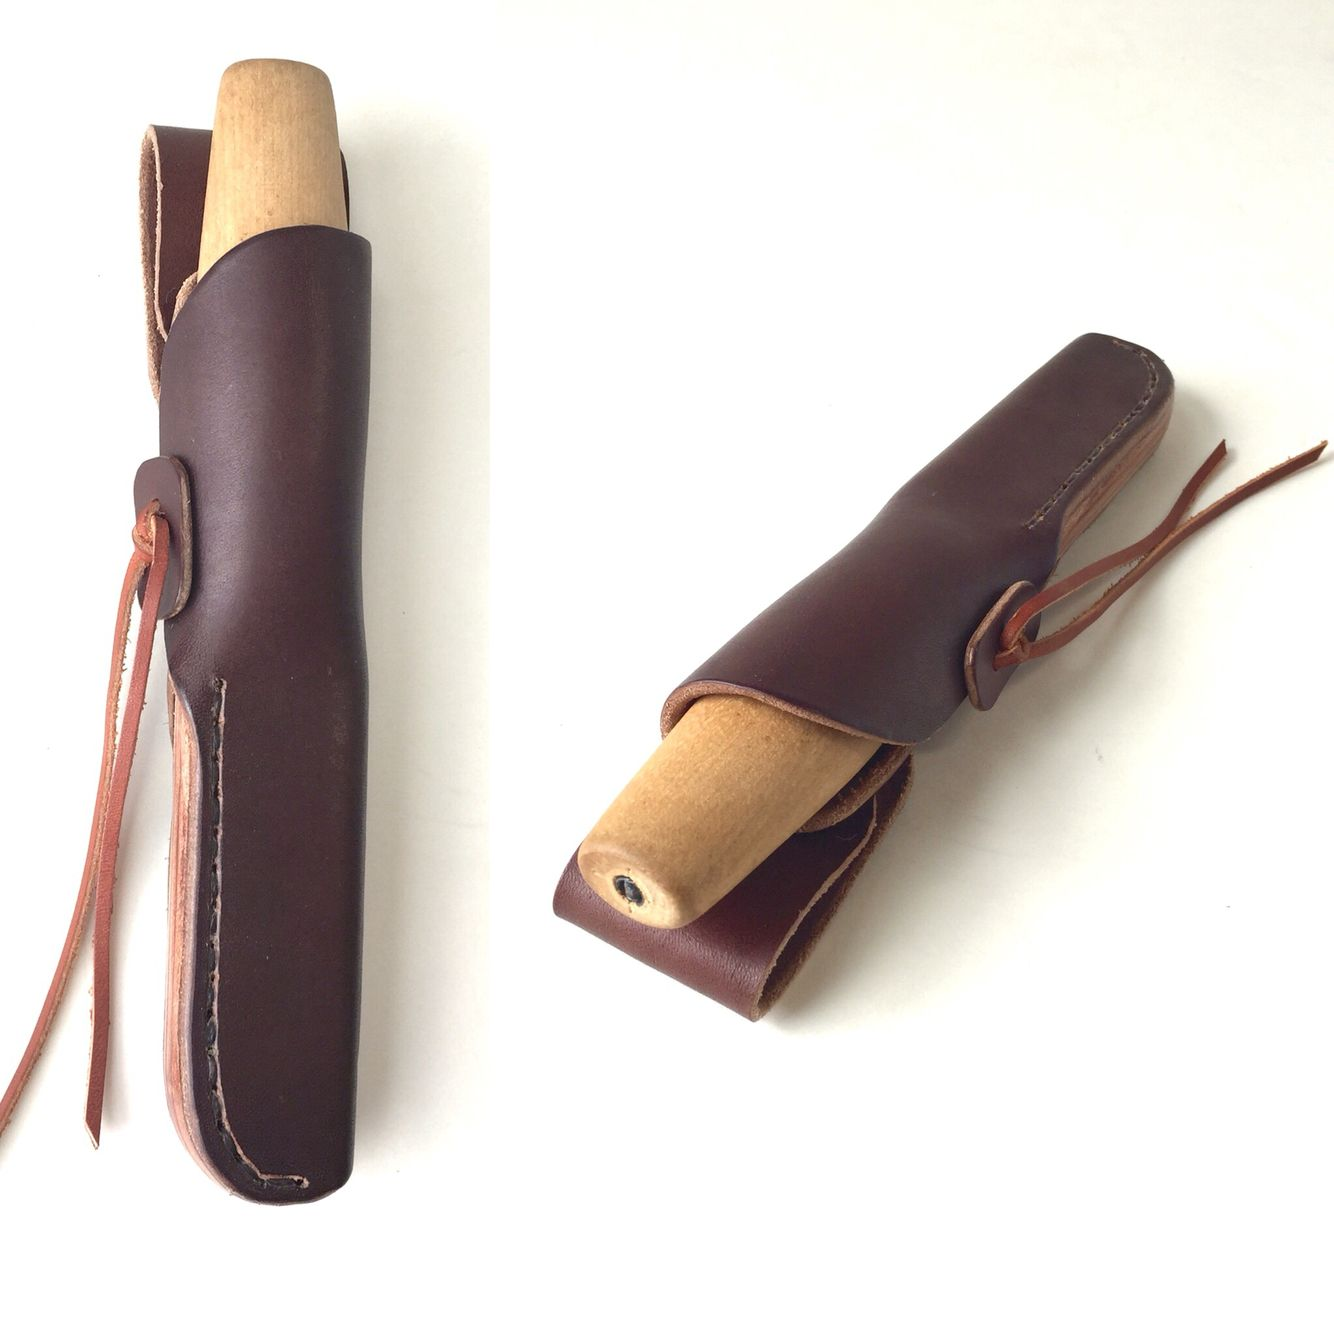 Custom Leather Knife Sheath For Morakniv Erik Frost 106 Wood